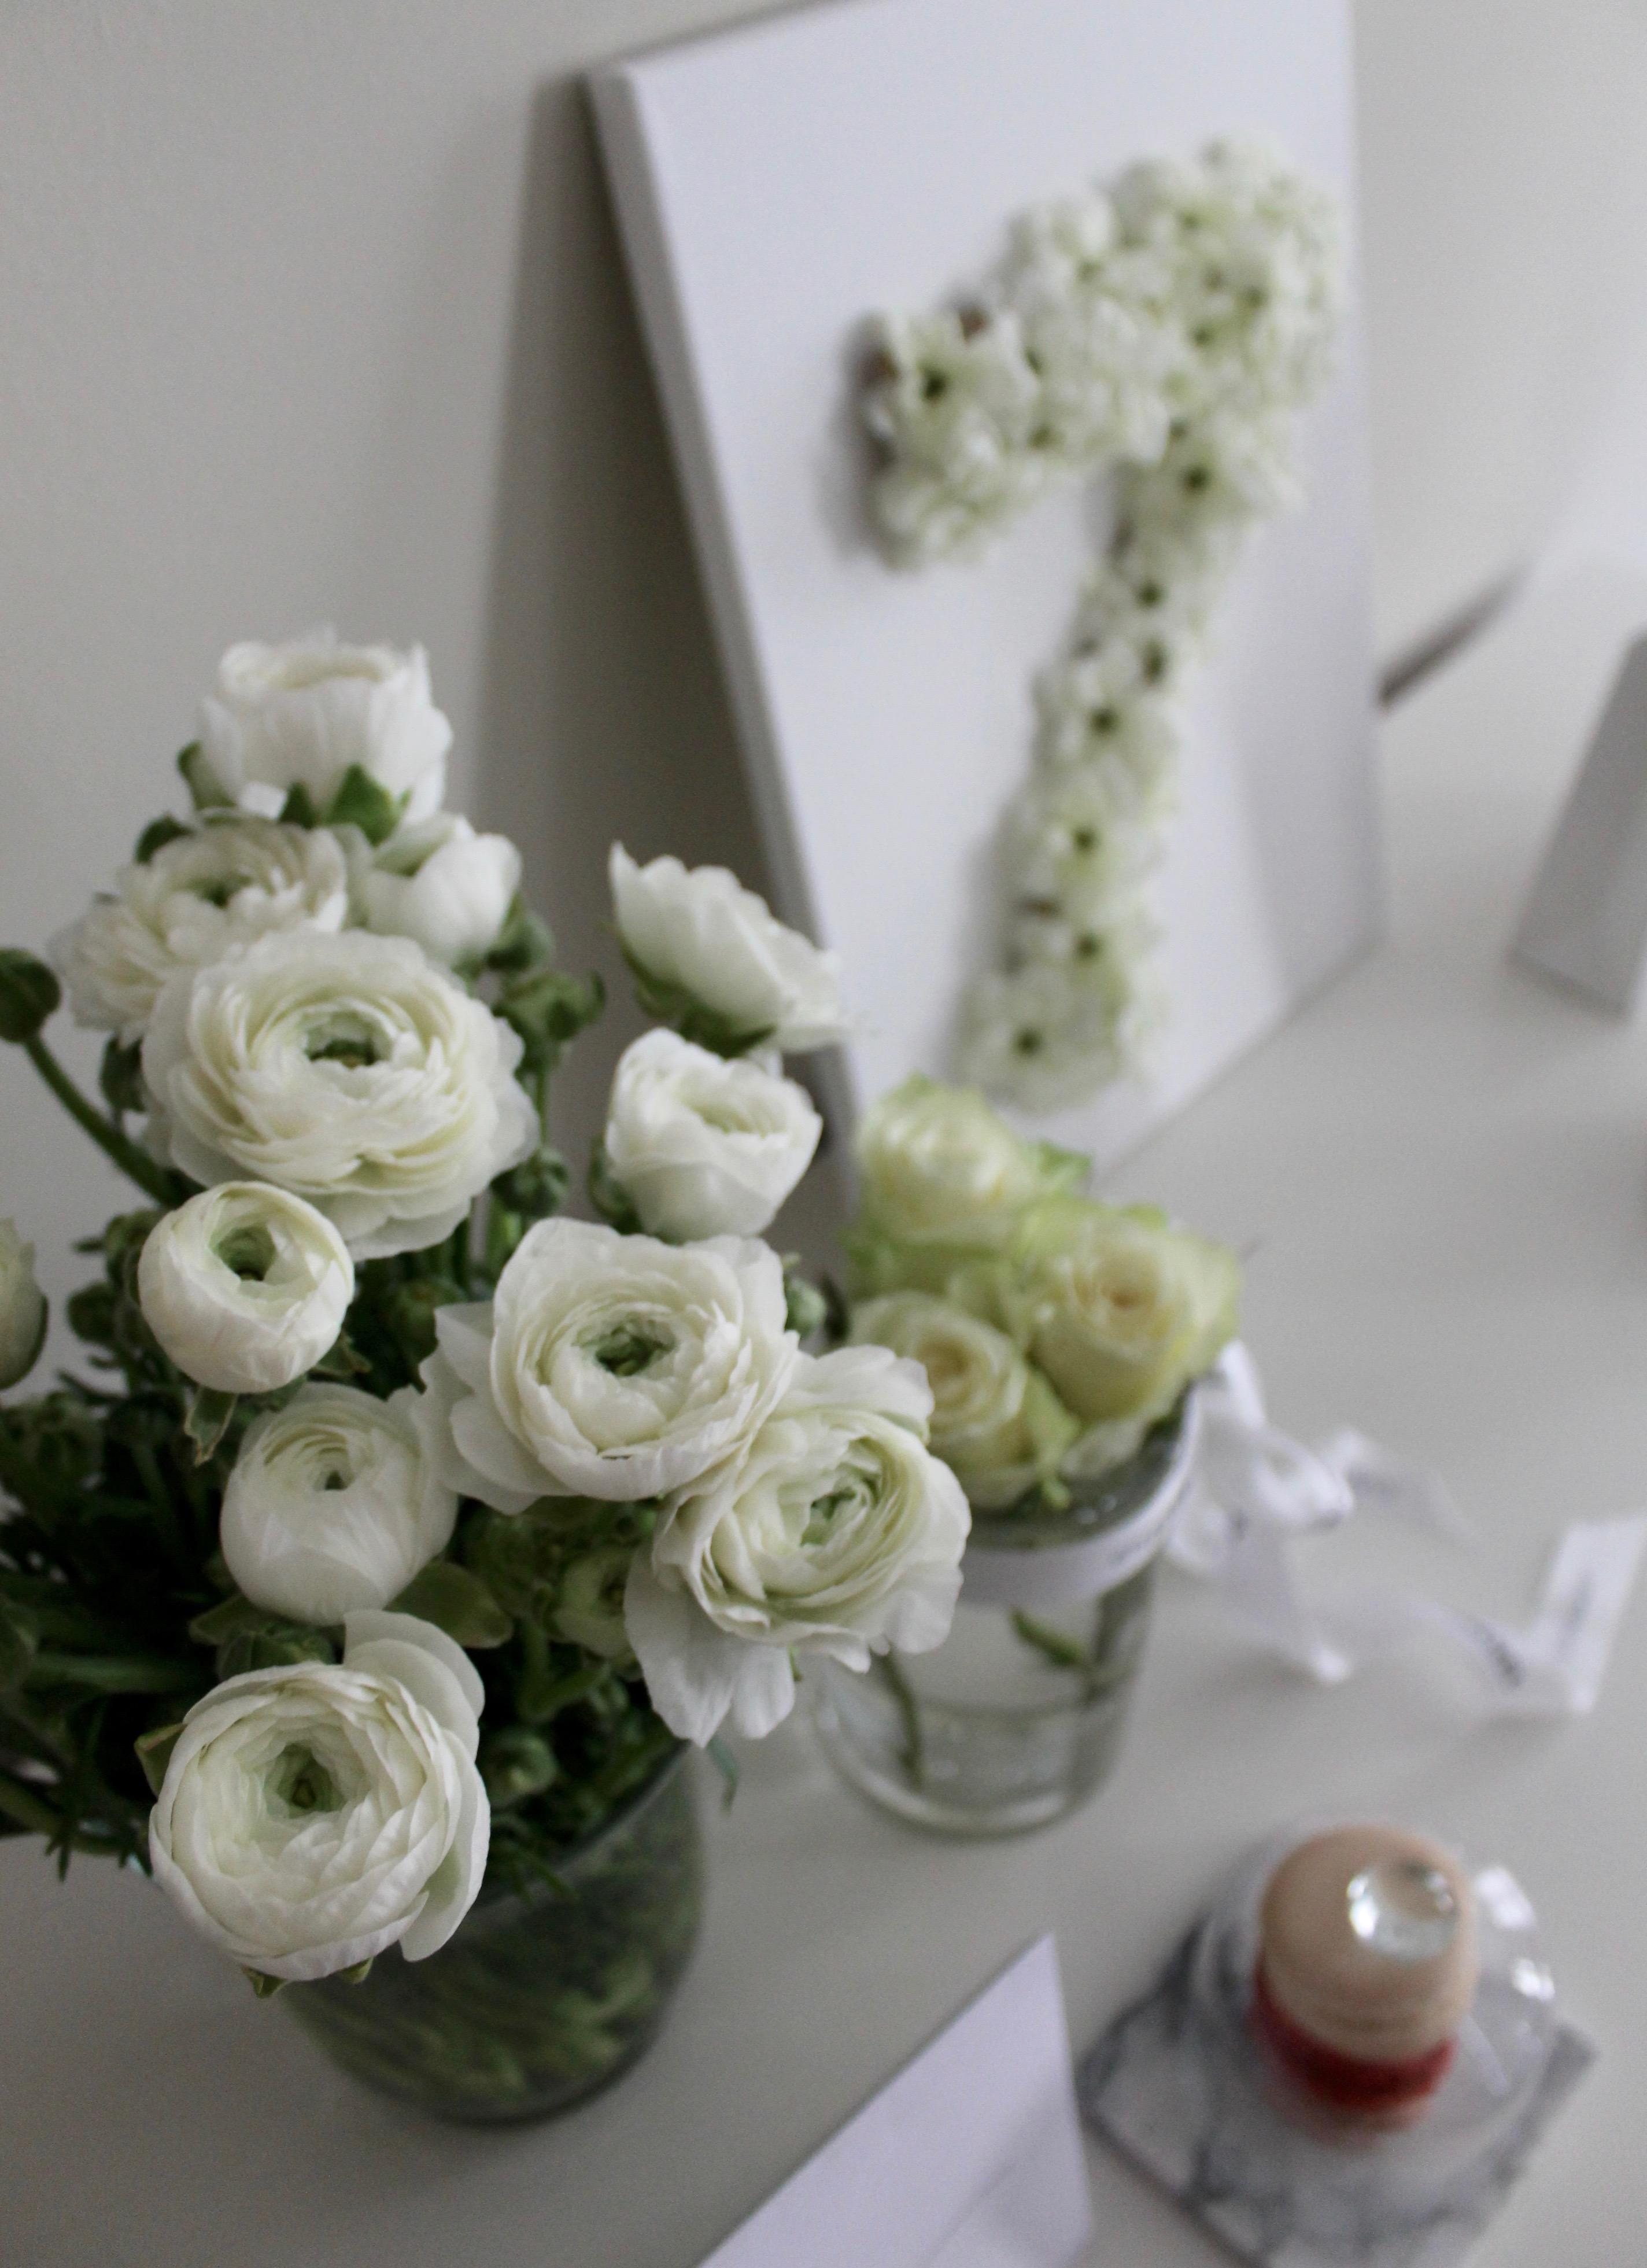 ENDOXIST | Menswear Blogger | Street Style | Seventh Anniversary | White Roses & Pandora